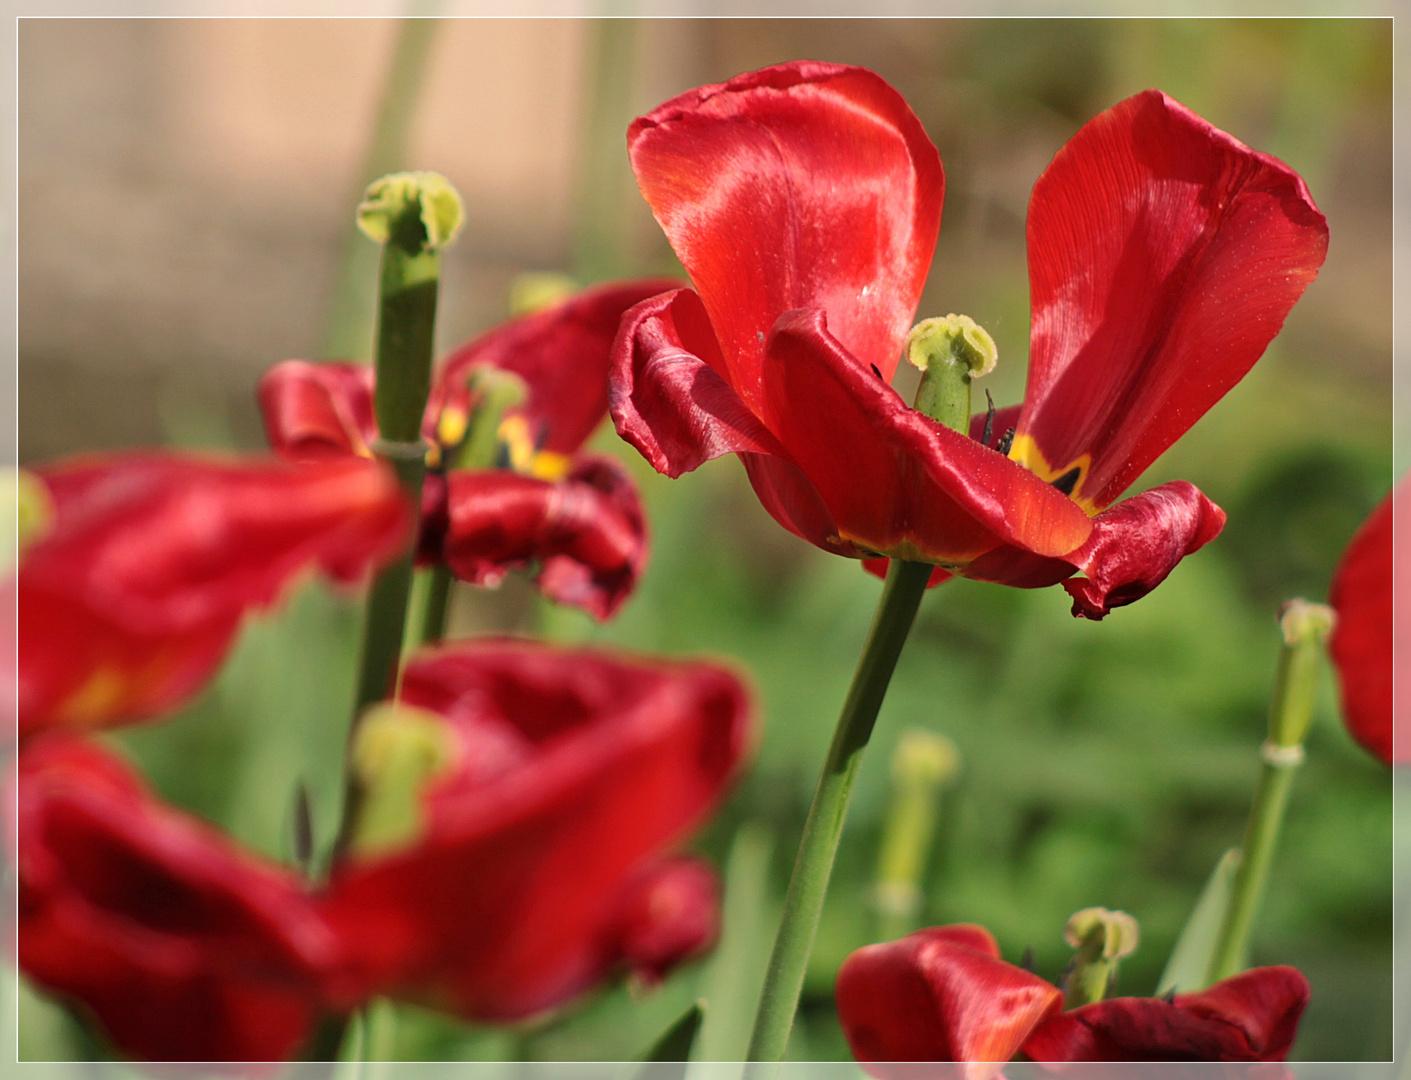 schon fast verbl hte tulpen foto bild rot tulpen natur bilder auf fotocommunity. Black Bedroom Furniture Sets. Home Design Ideas